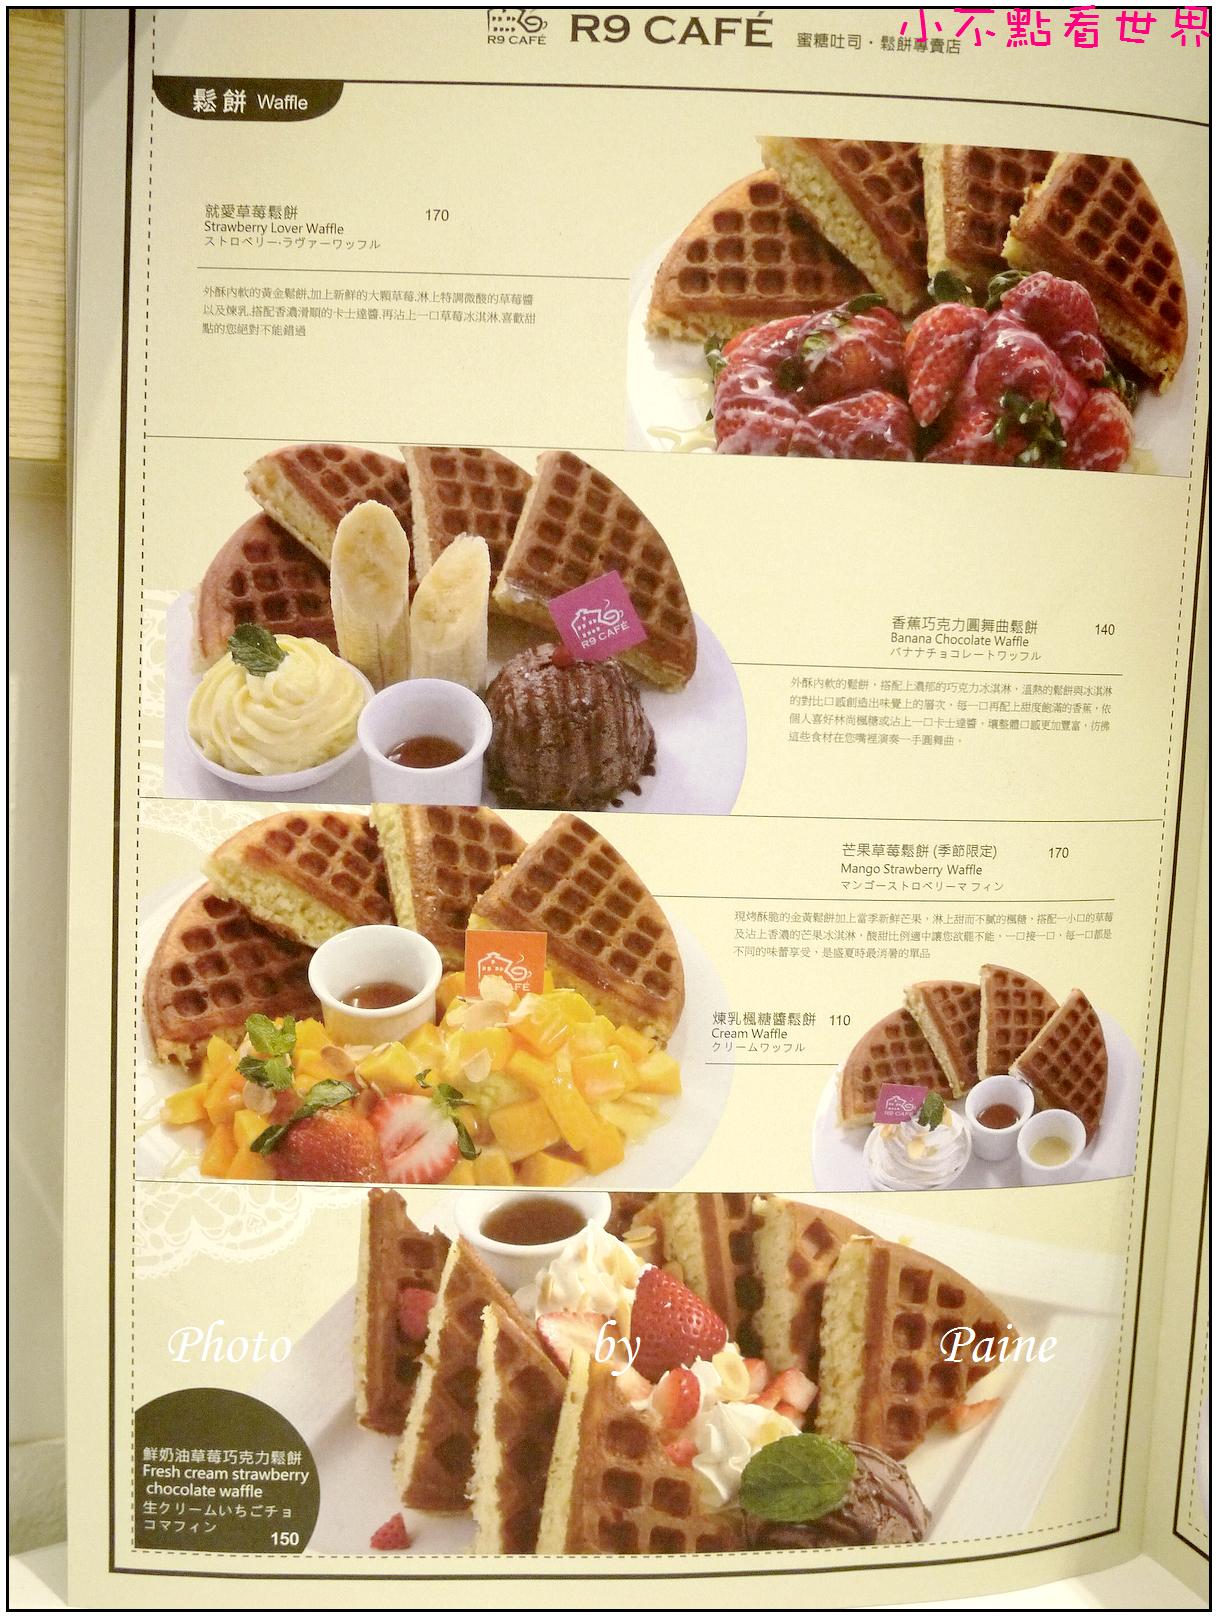 桃園R9 CAFE (22).JPG